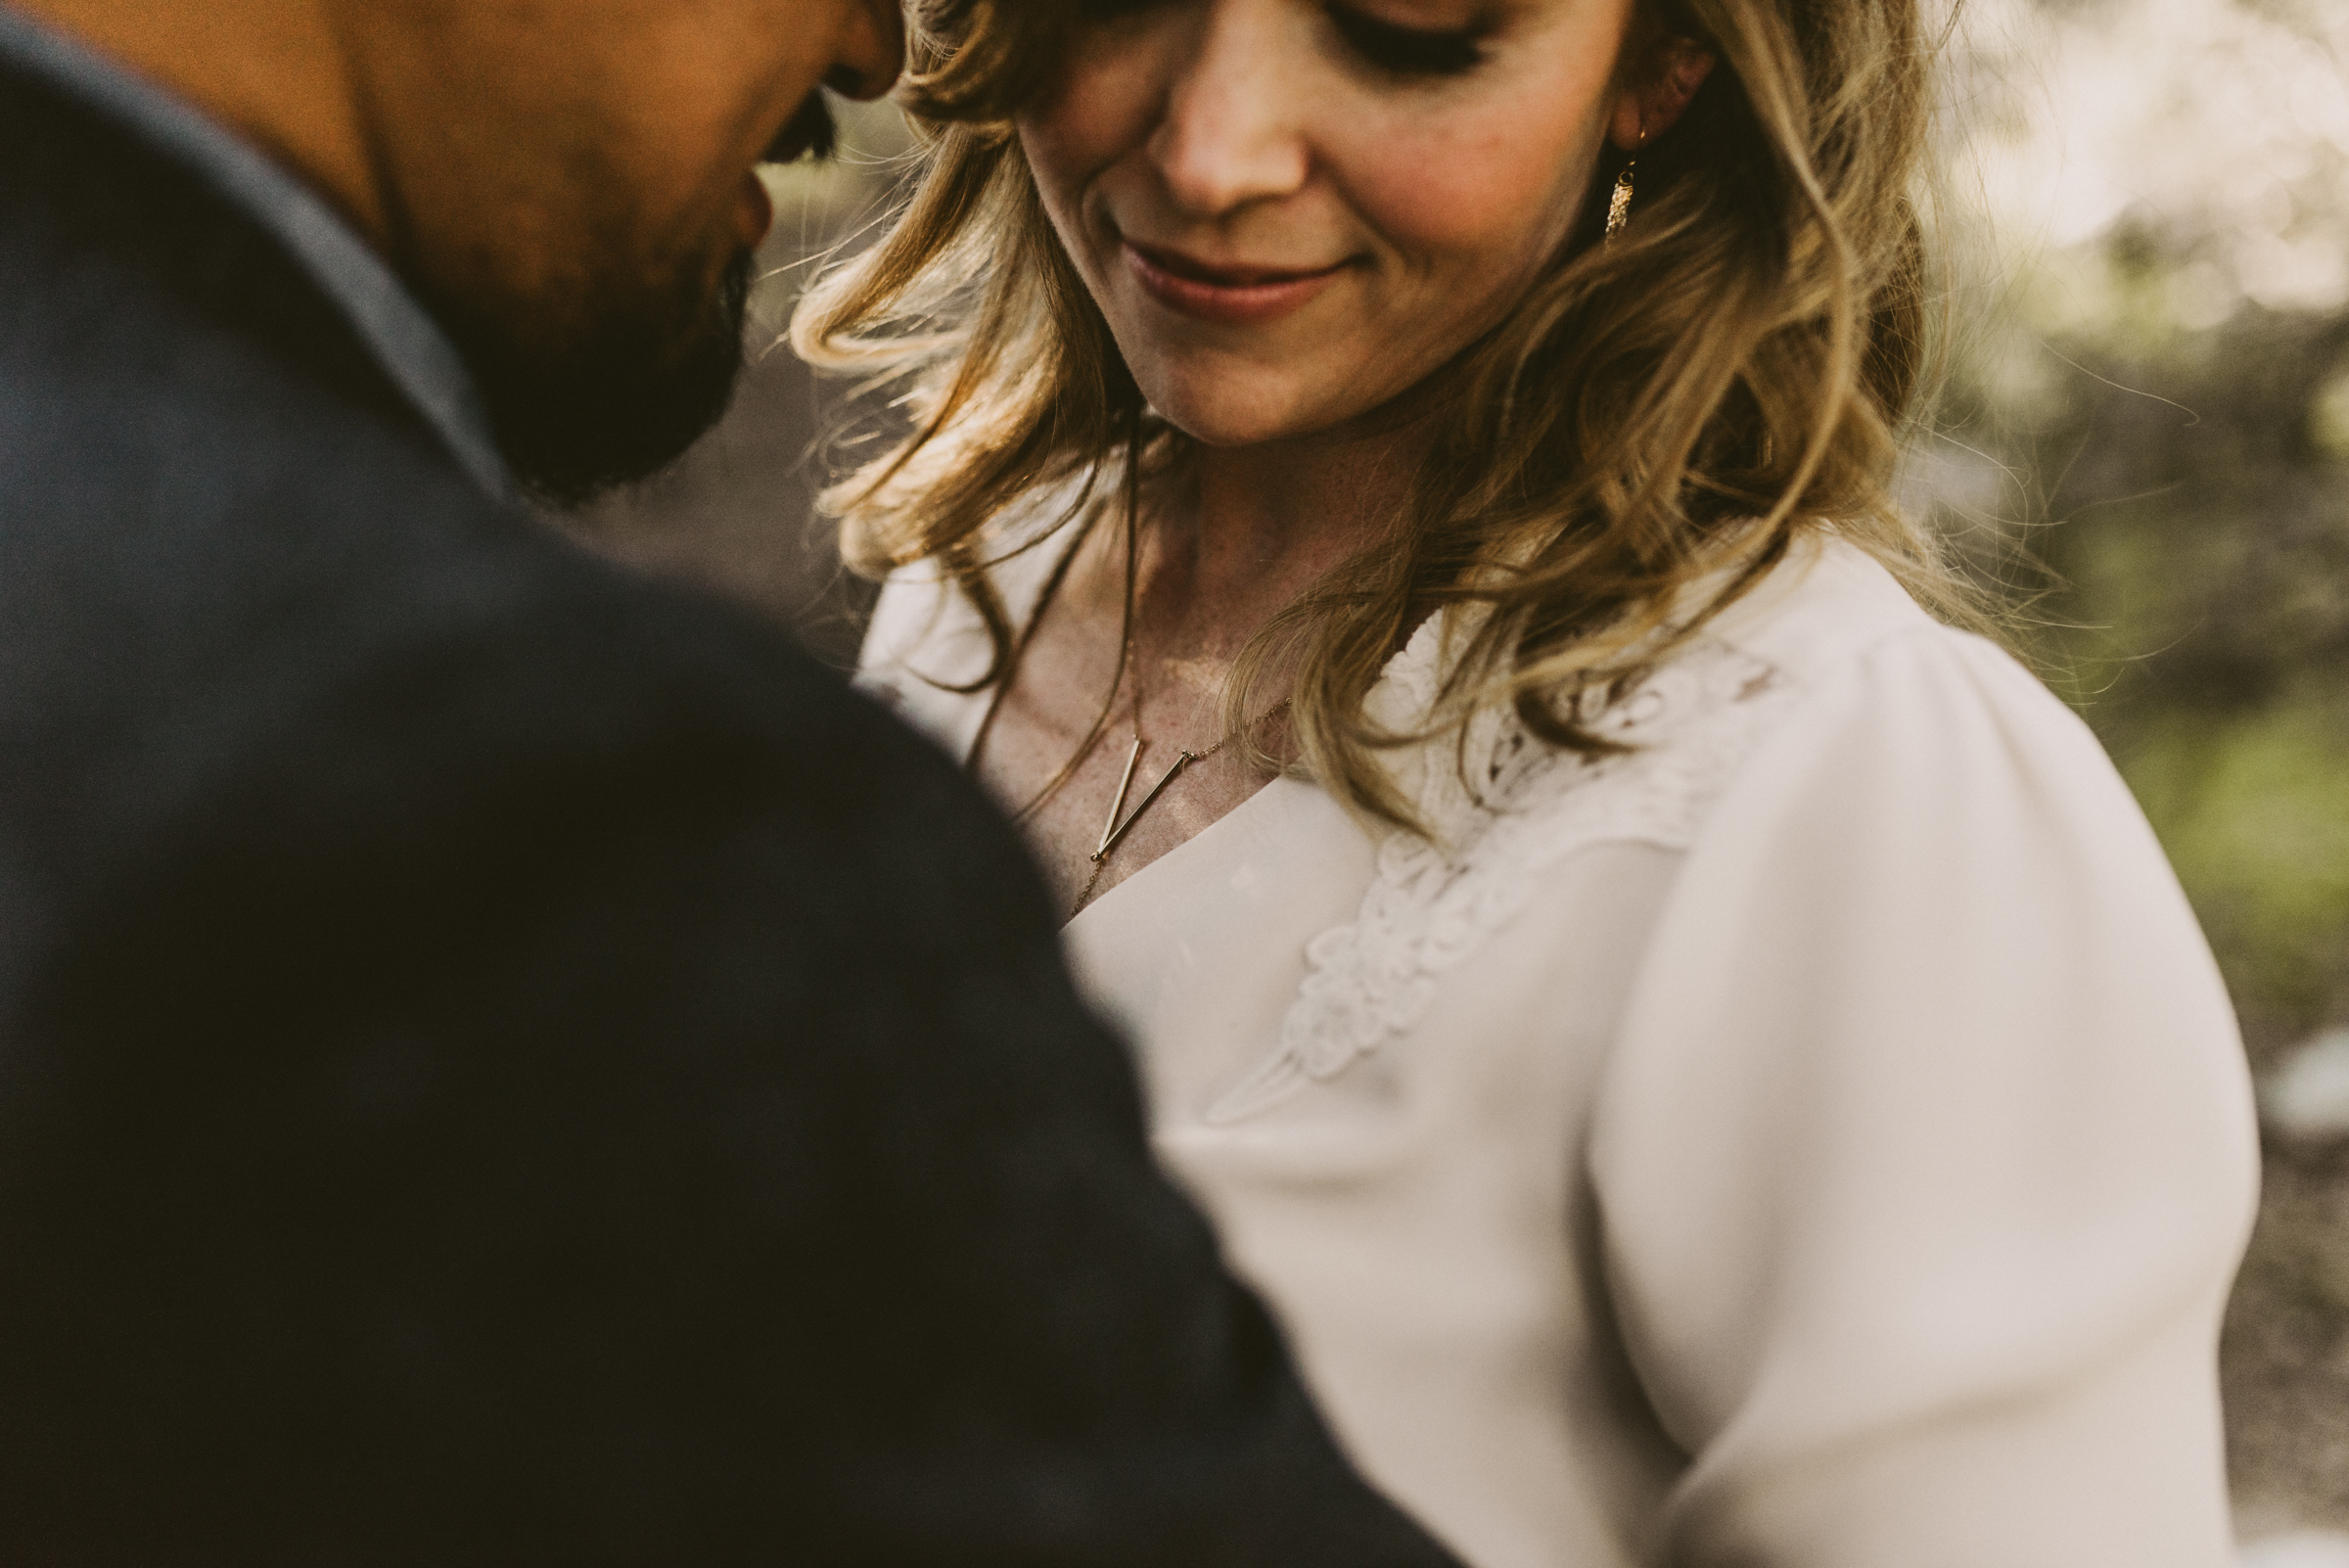 ©Isaiah + Taylor Photography - Intimate Elopement, Eaton Canyon, Los Angeles Wedding Photographer-18.jpg